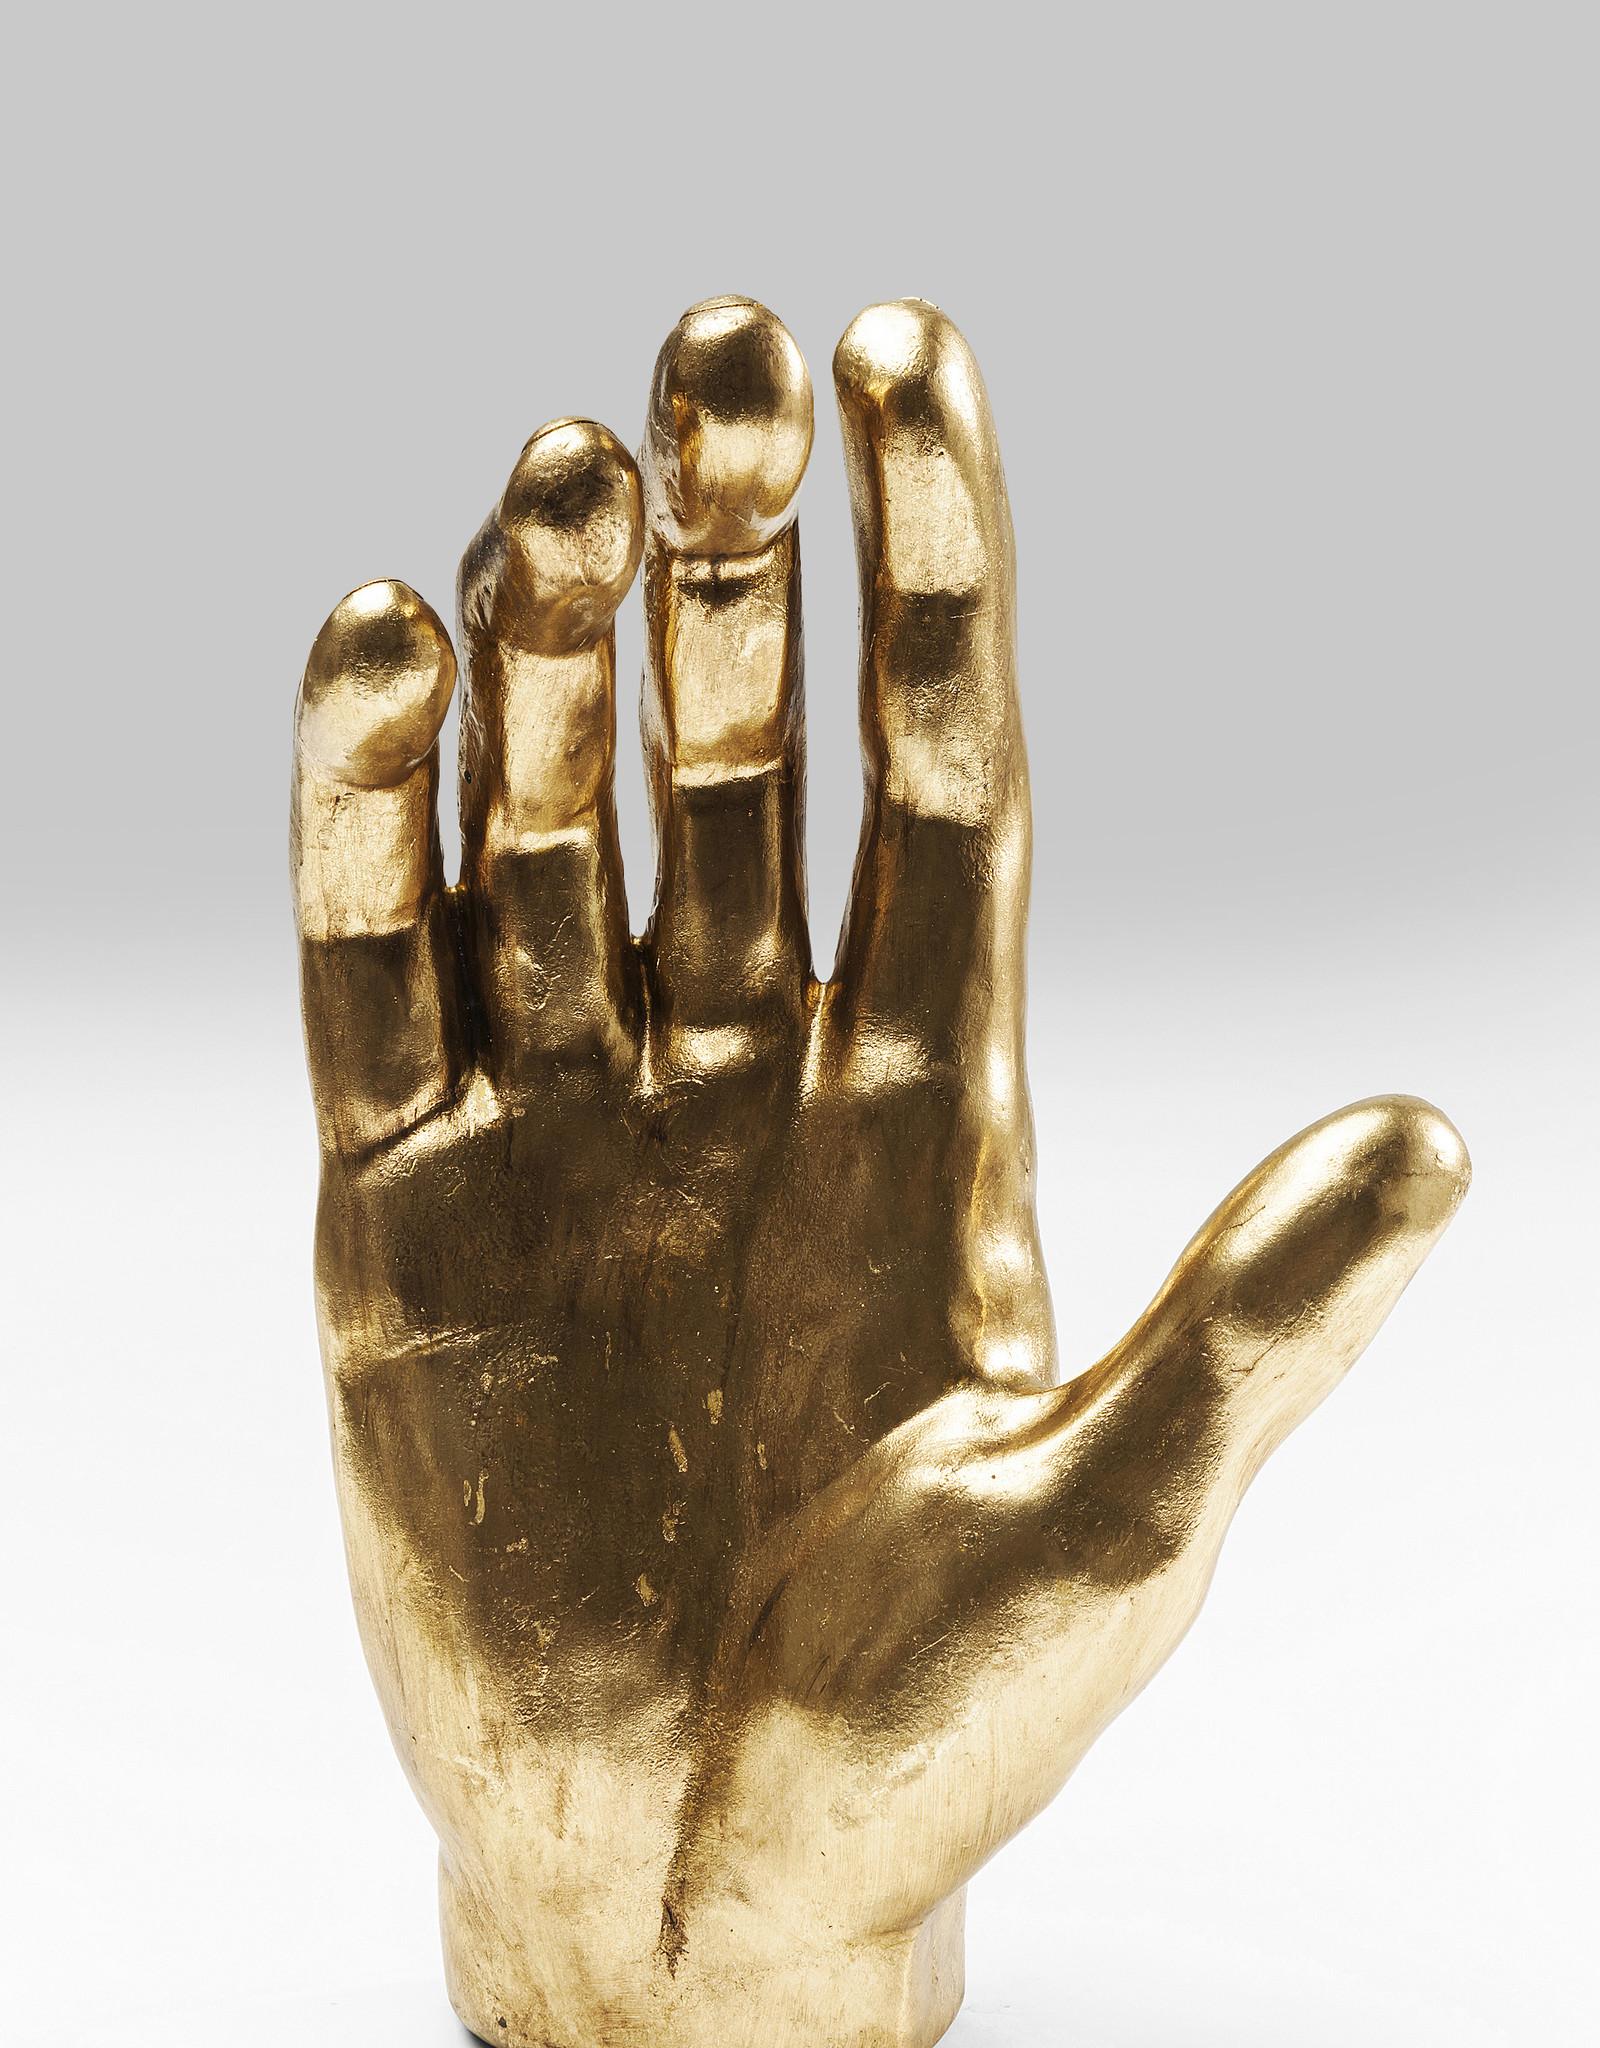 KARE DESIGN Deco Object Mano Gold